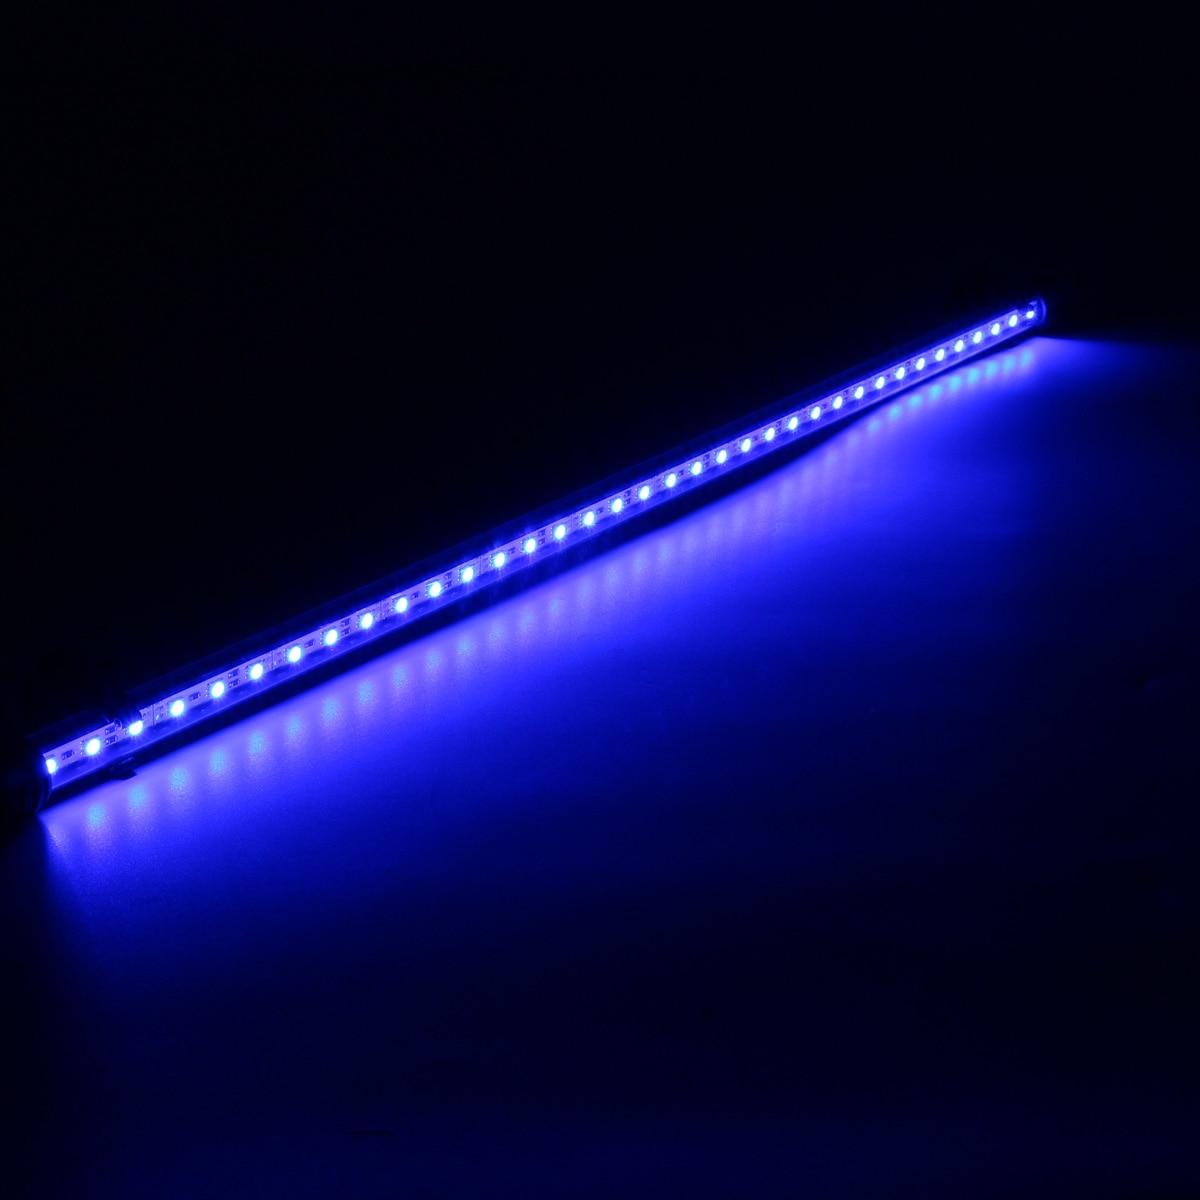 Smuxi 62CM RGB LED Aquarium Fish Tank Light for 70 80CM Fish Tank Bar Submersible Plant Grow Lamp IP68 AcrylicWaterproof 110V|LED Underwater Lights| |  - title=